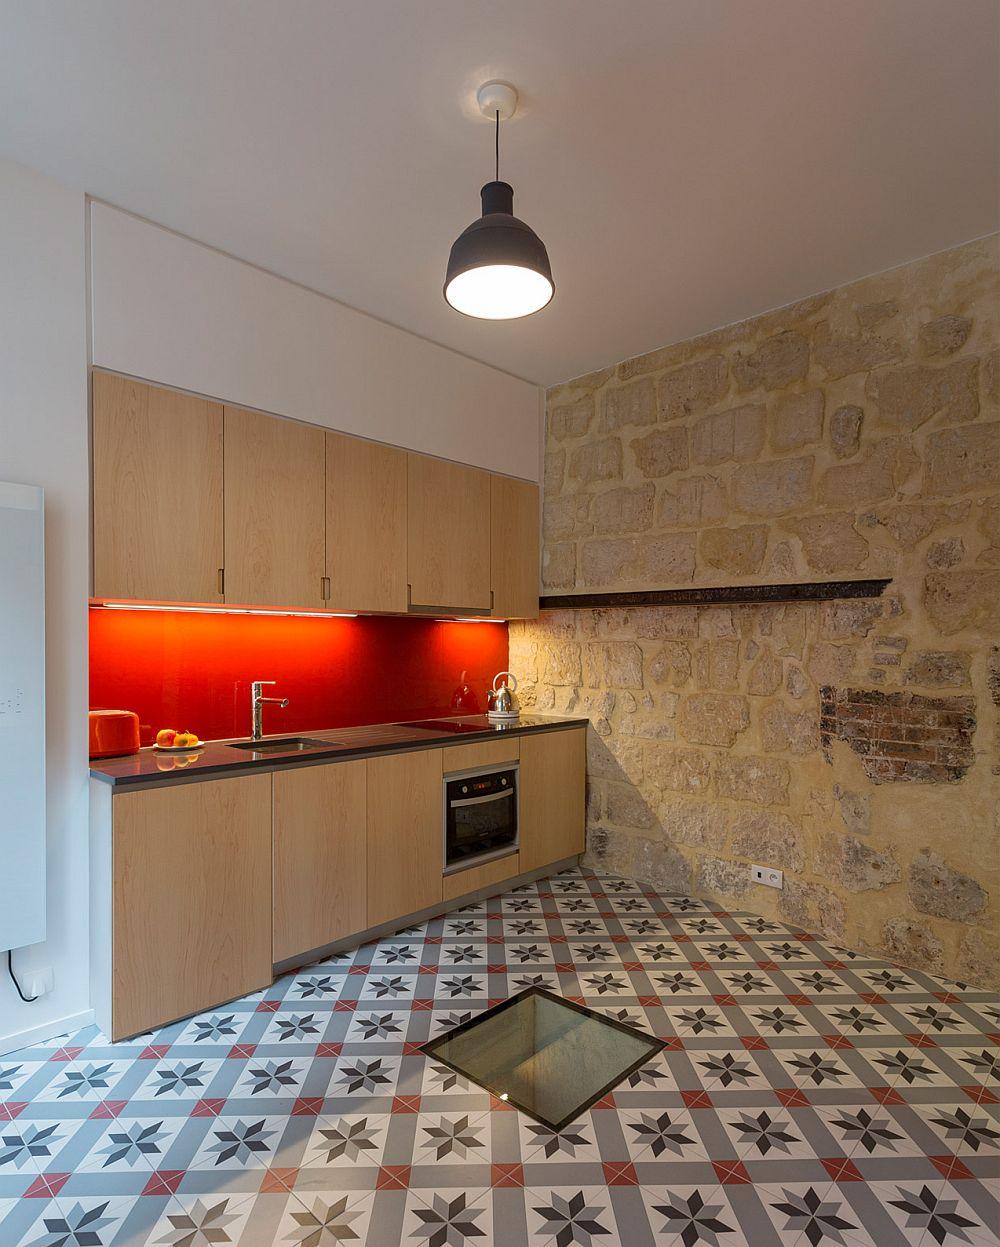 adelaparvu.com despre bucatarie 24 mp transformata in garsoniera, design arh. Anne Rolland, Foto Jerome Fleurier (3)